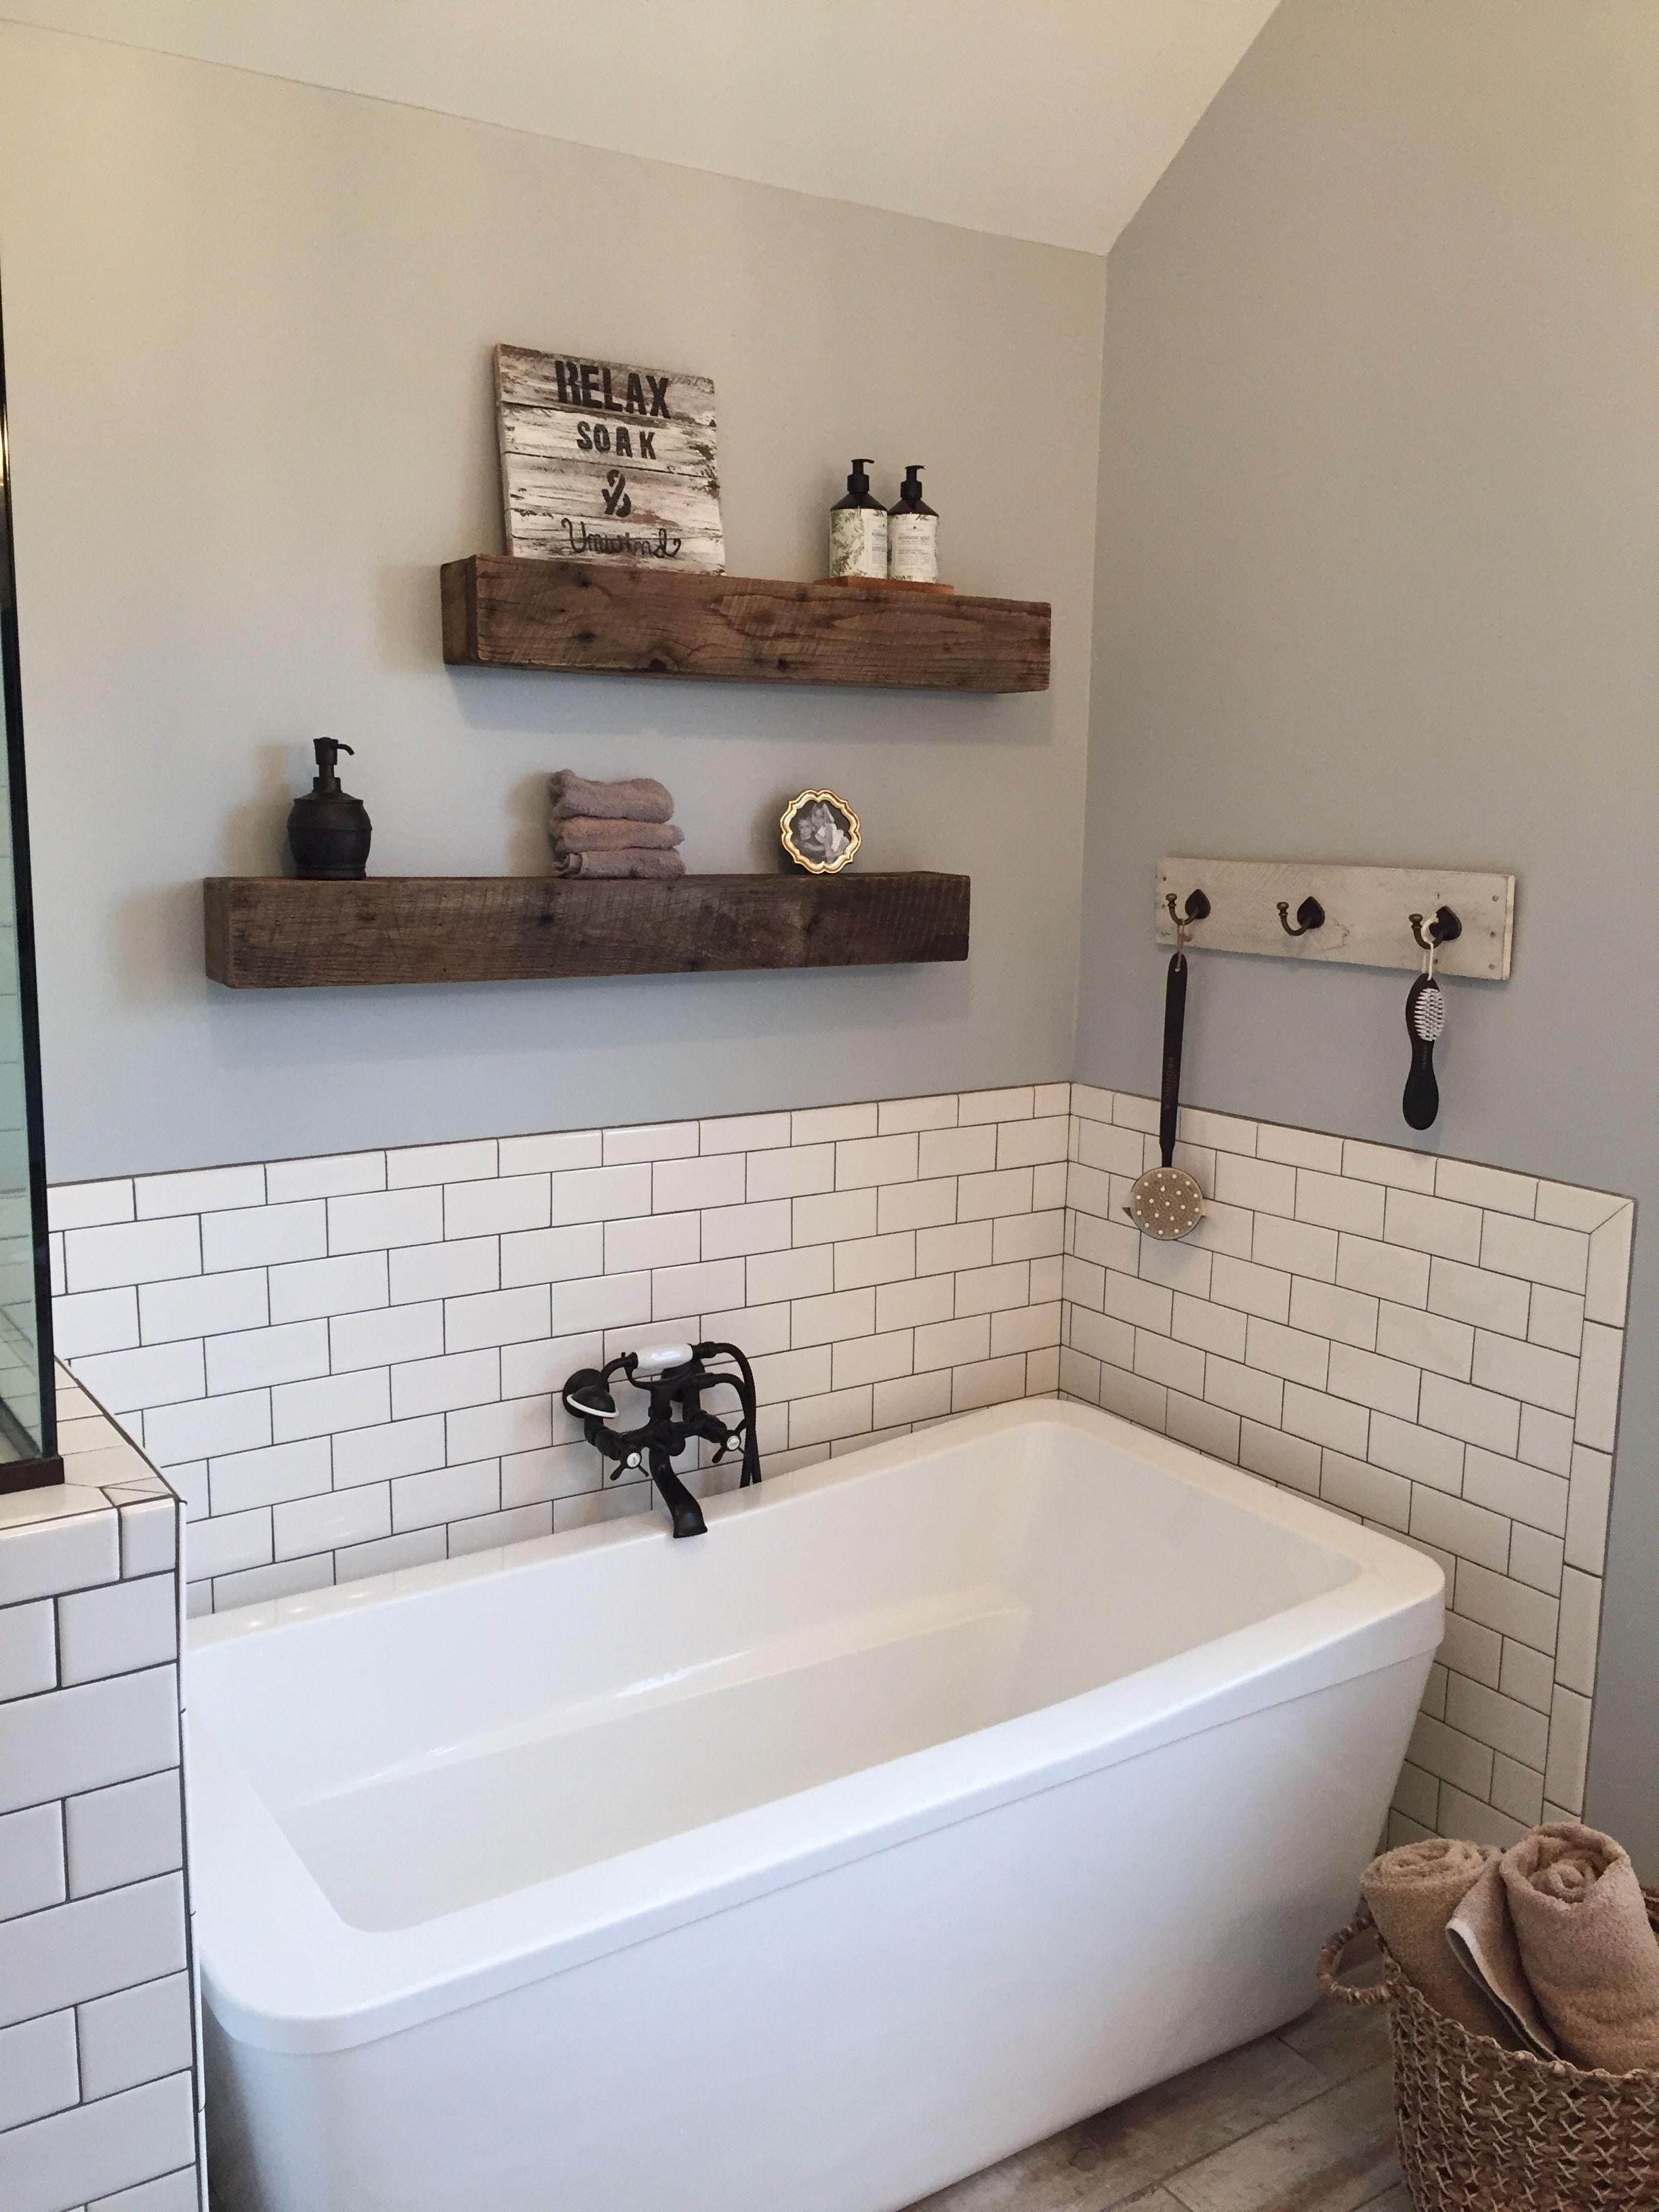 barn wood floating shelves hanging shelve and diy relax sign rh ar pinterest com